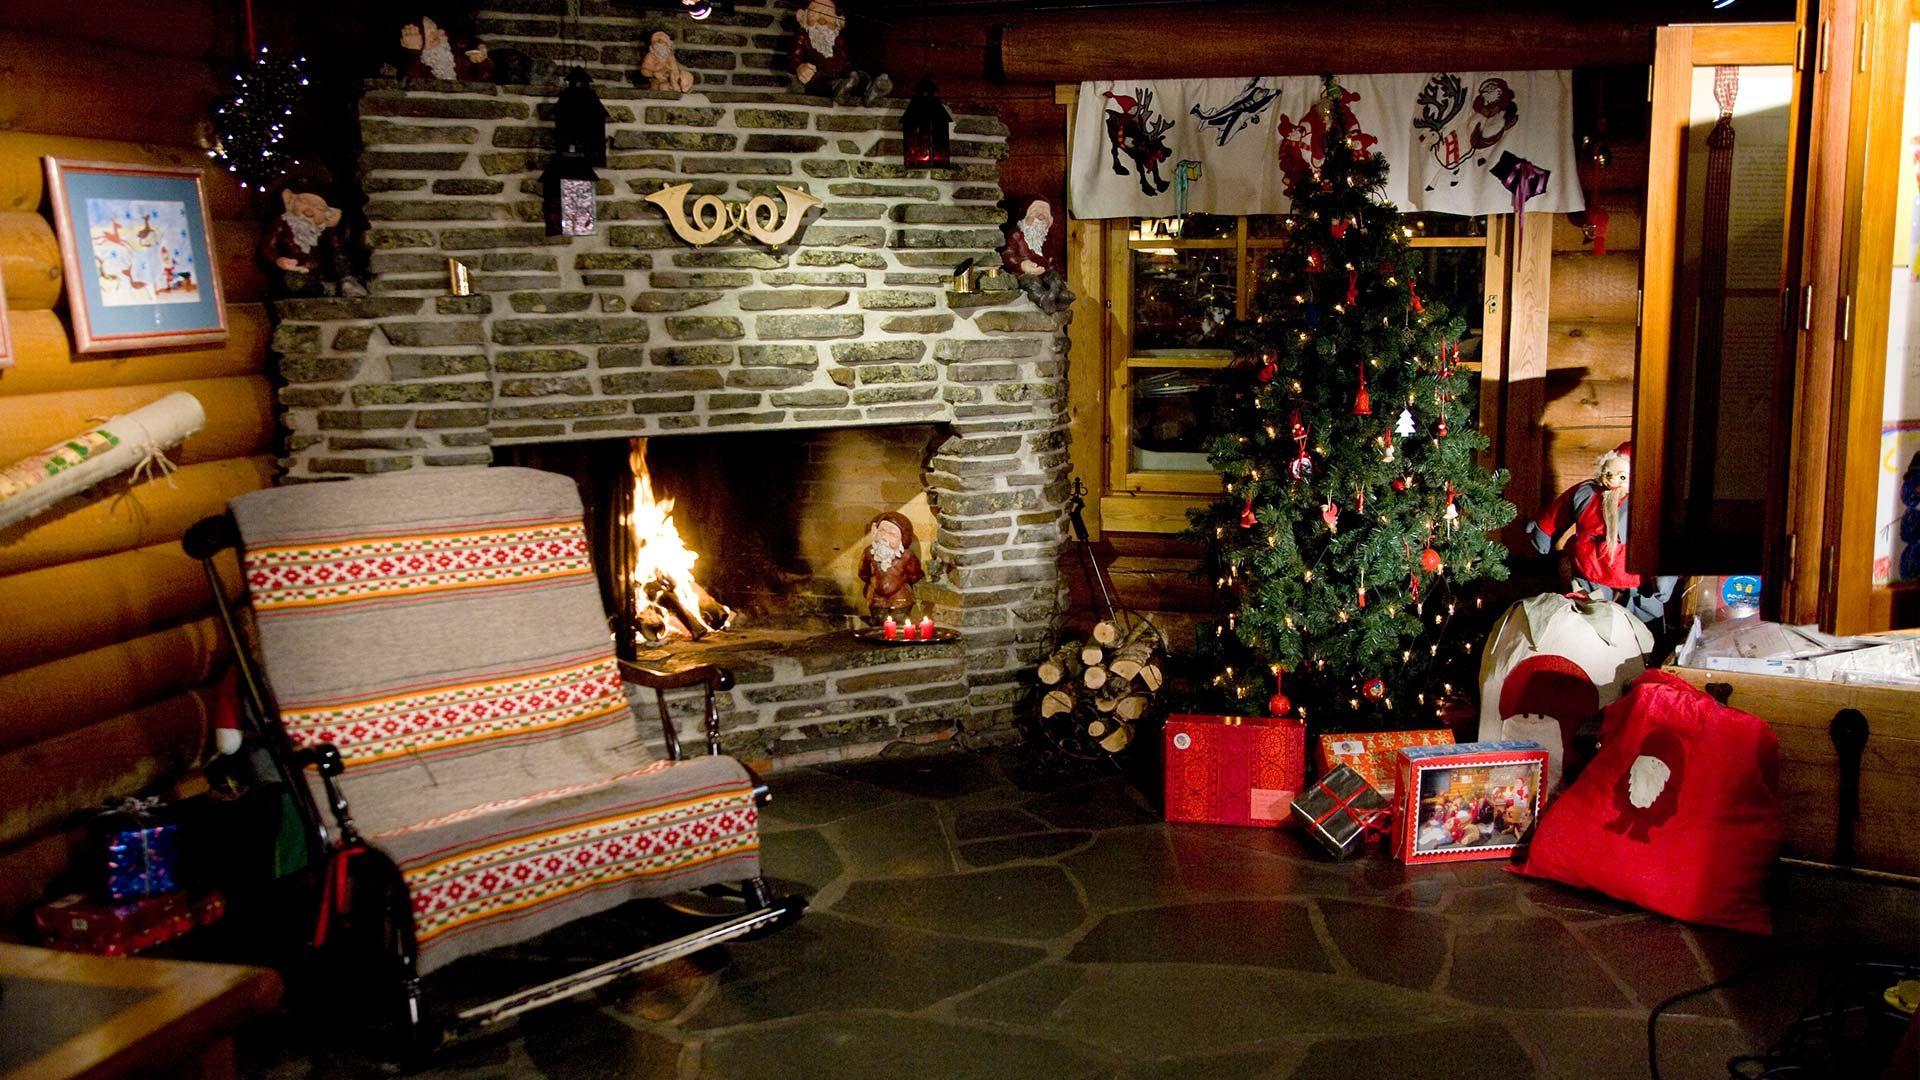 Living Room Santa Claus Village Holiday Wallpaper Christmas Scenes